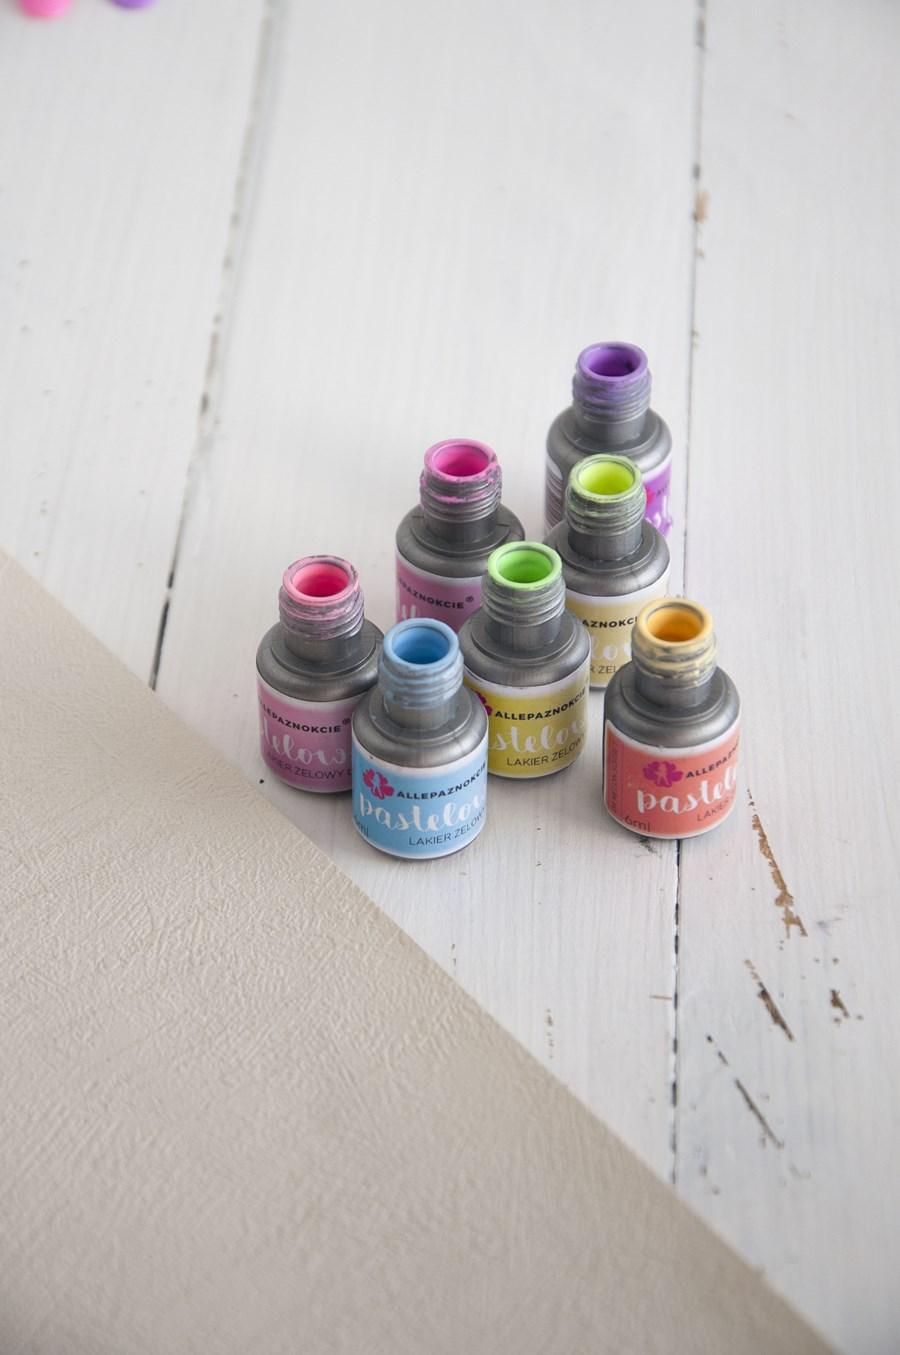 manicure hybrydowy, lakiery hybrydowe, pastele allepaznokcie, lakiery hybrydowe allepaznokcie,